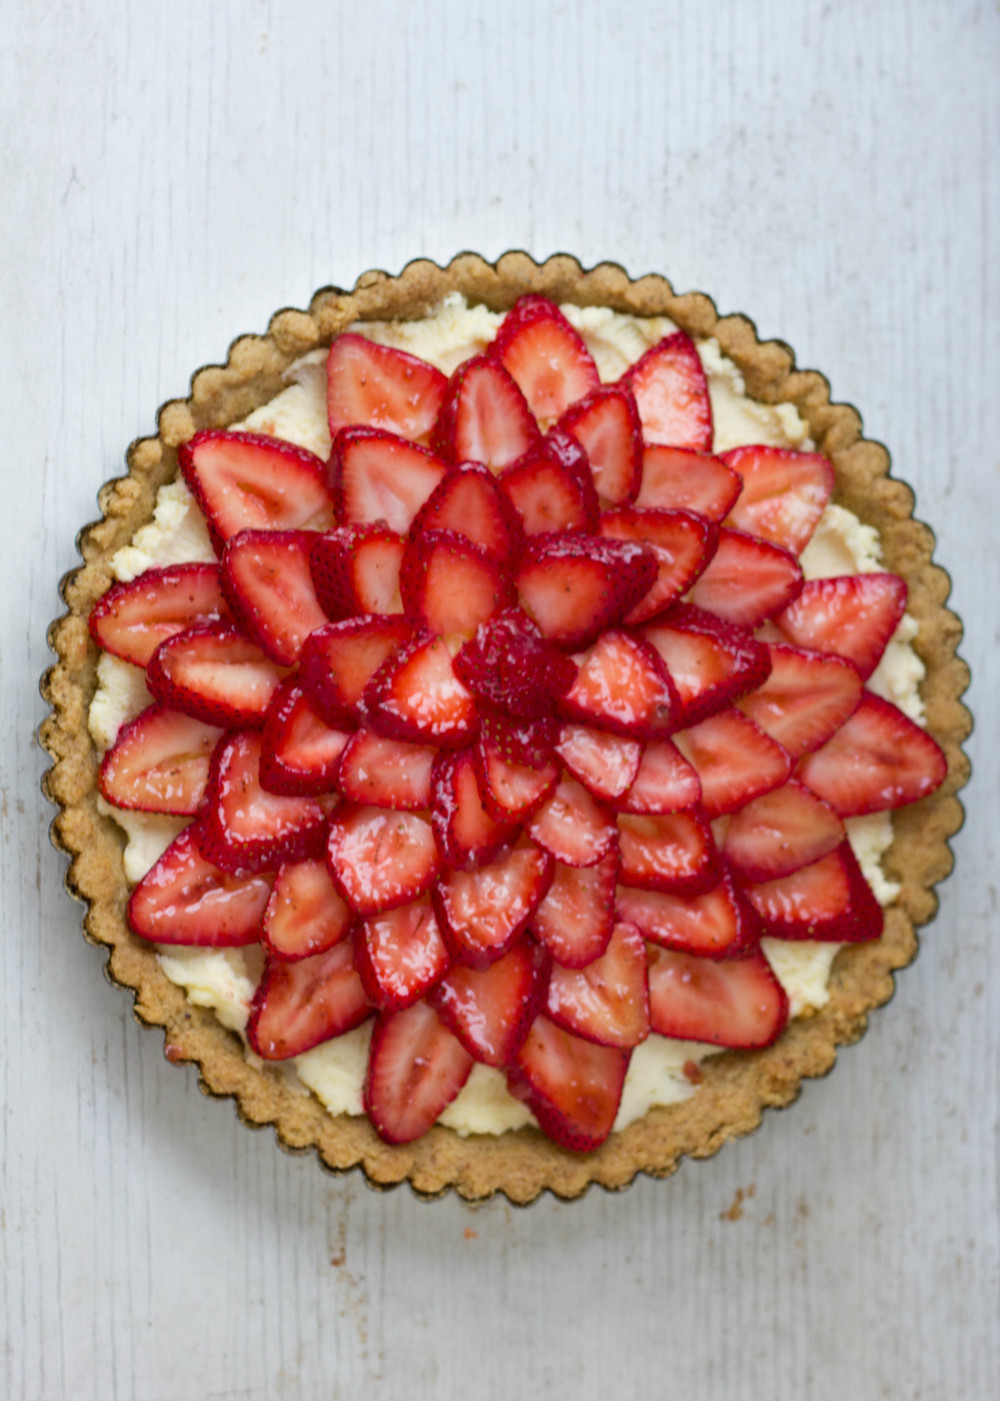 Gluten-free Strawberry Mascarpone Tart